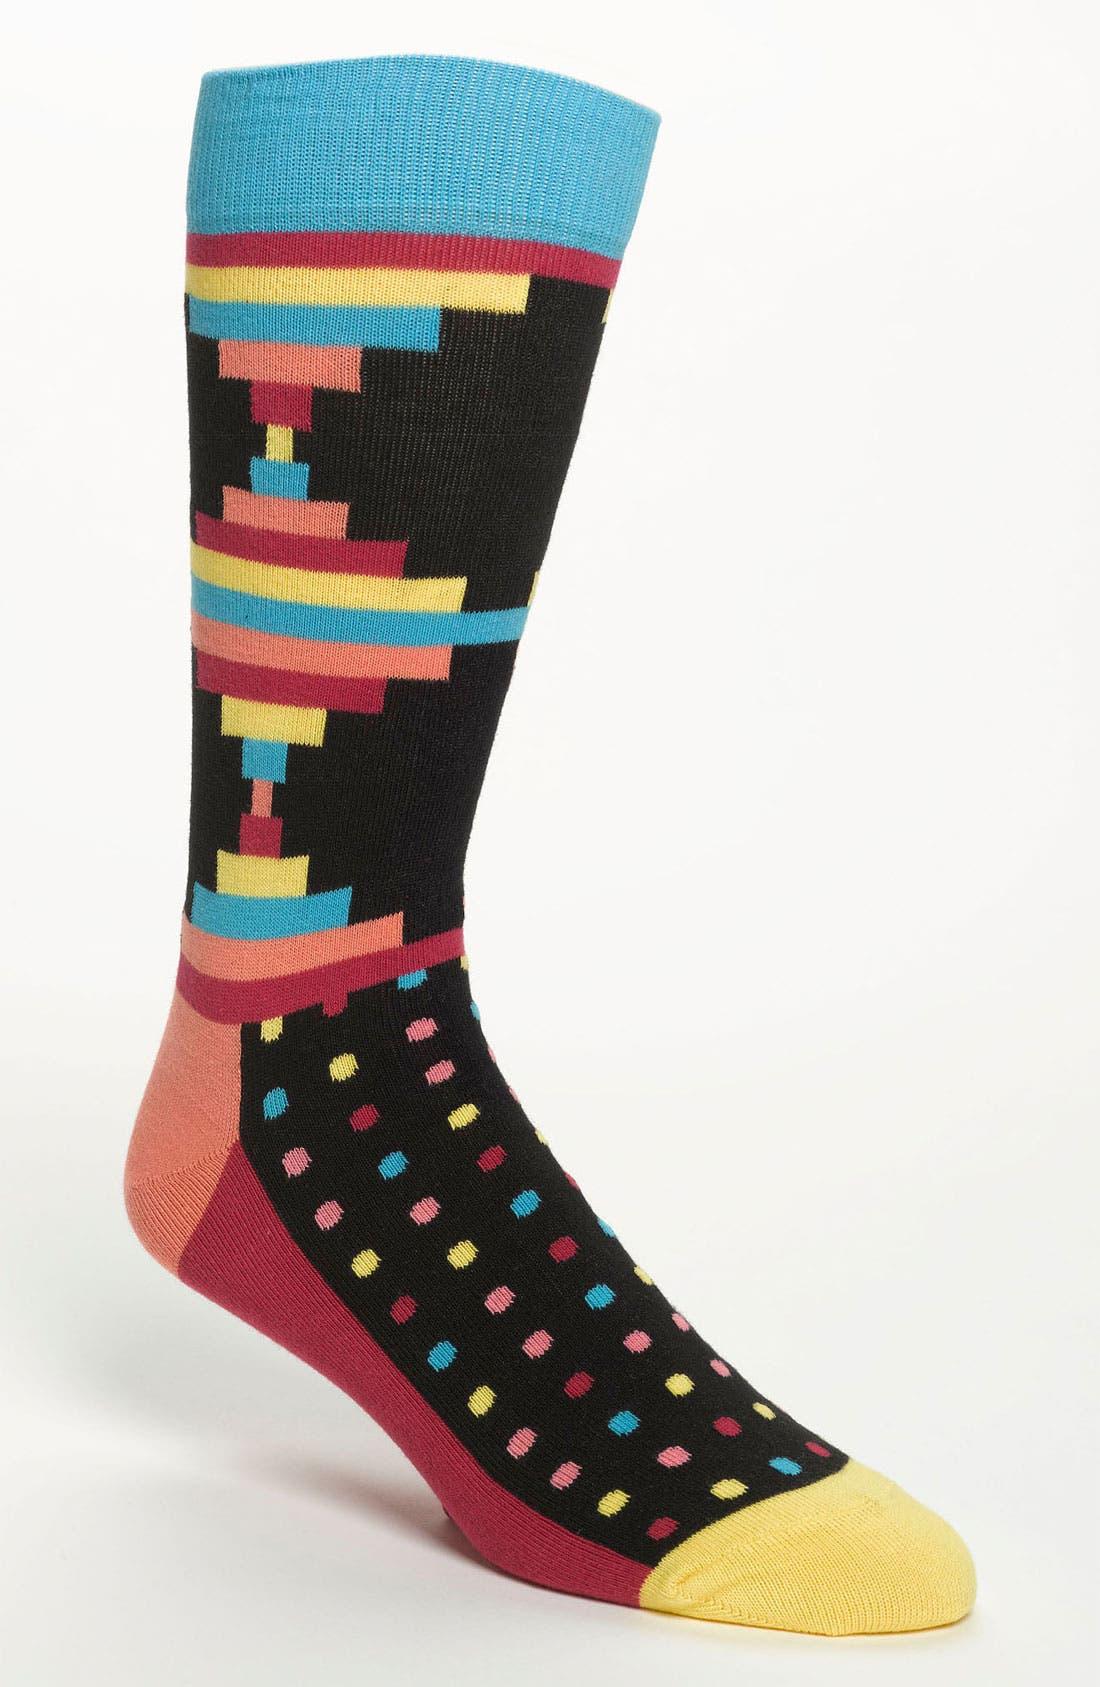 Alternate Image 1 Selected - Happy Socks 'Inca' Pattern Socks